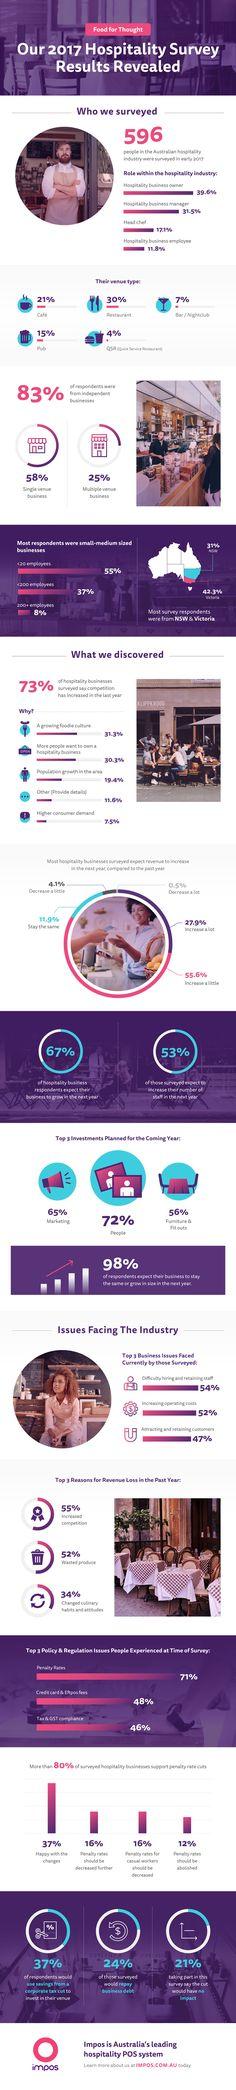 Australian Hospitality Industry Survey Stats Revealed